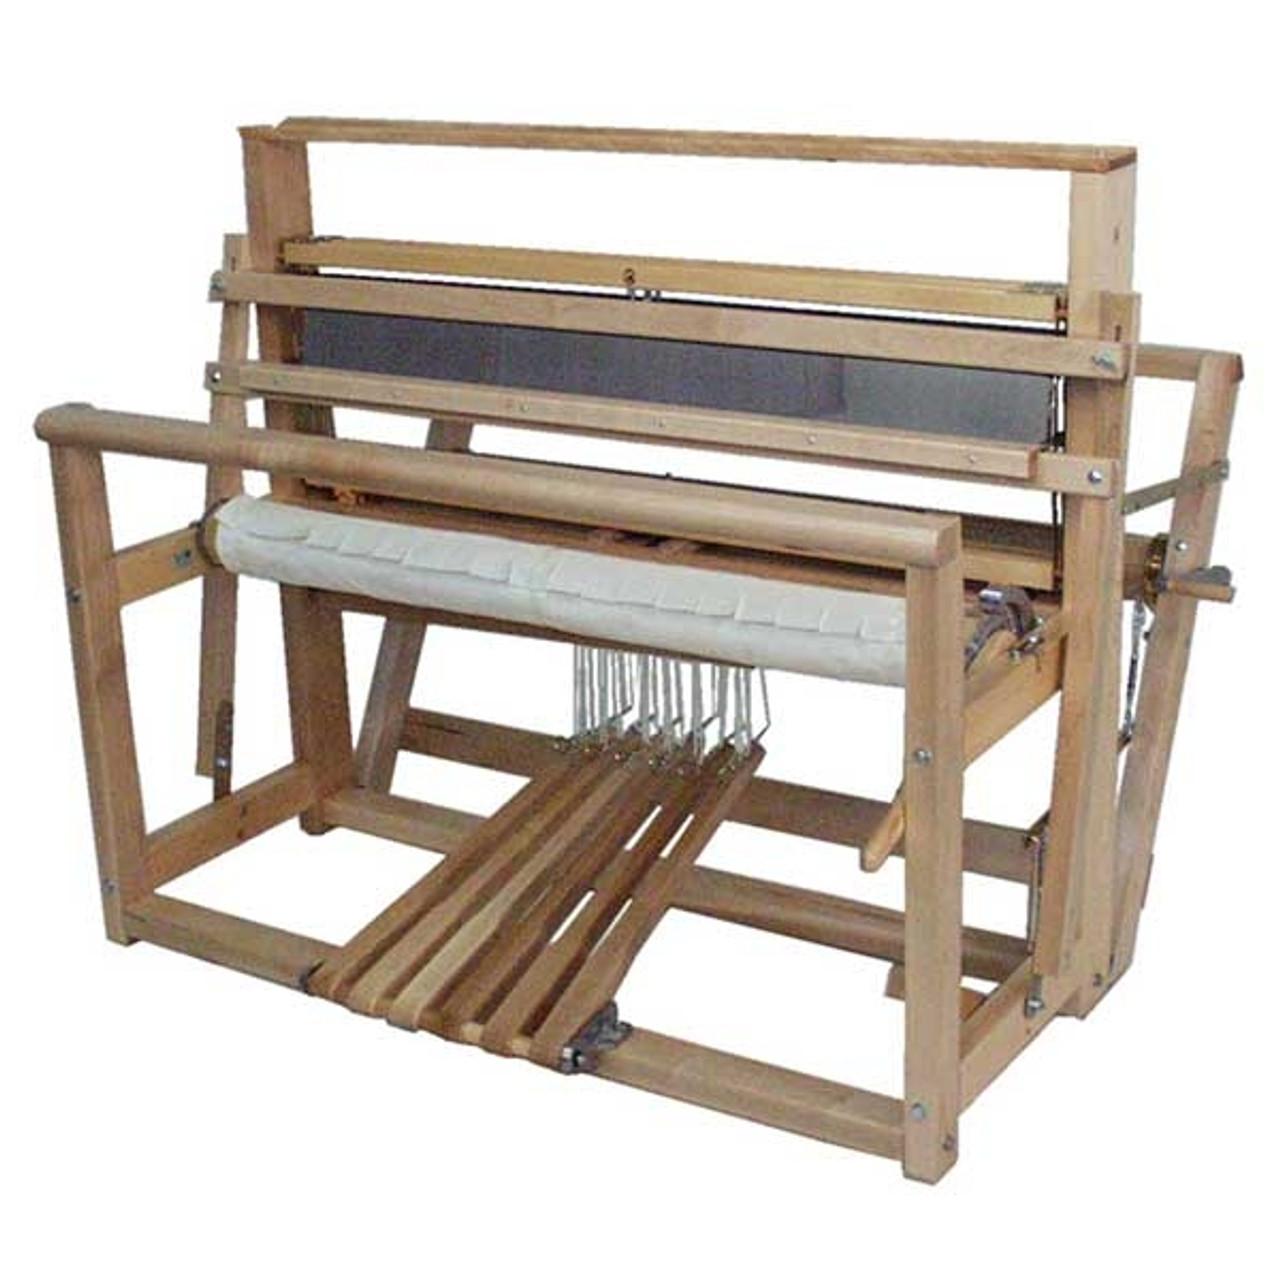 Leclerc Nilus Low Castle Floor Loom - 4 Harness